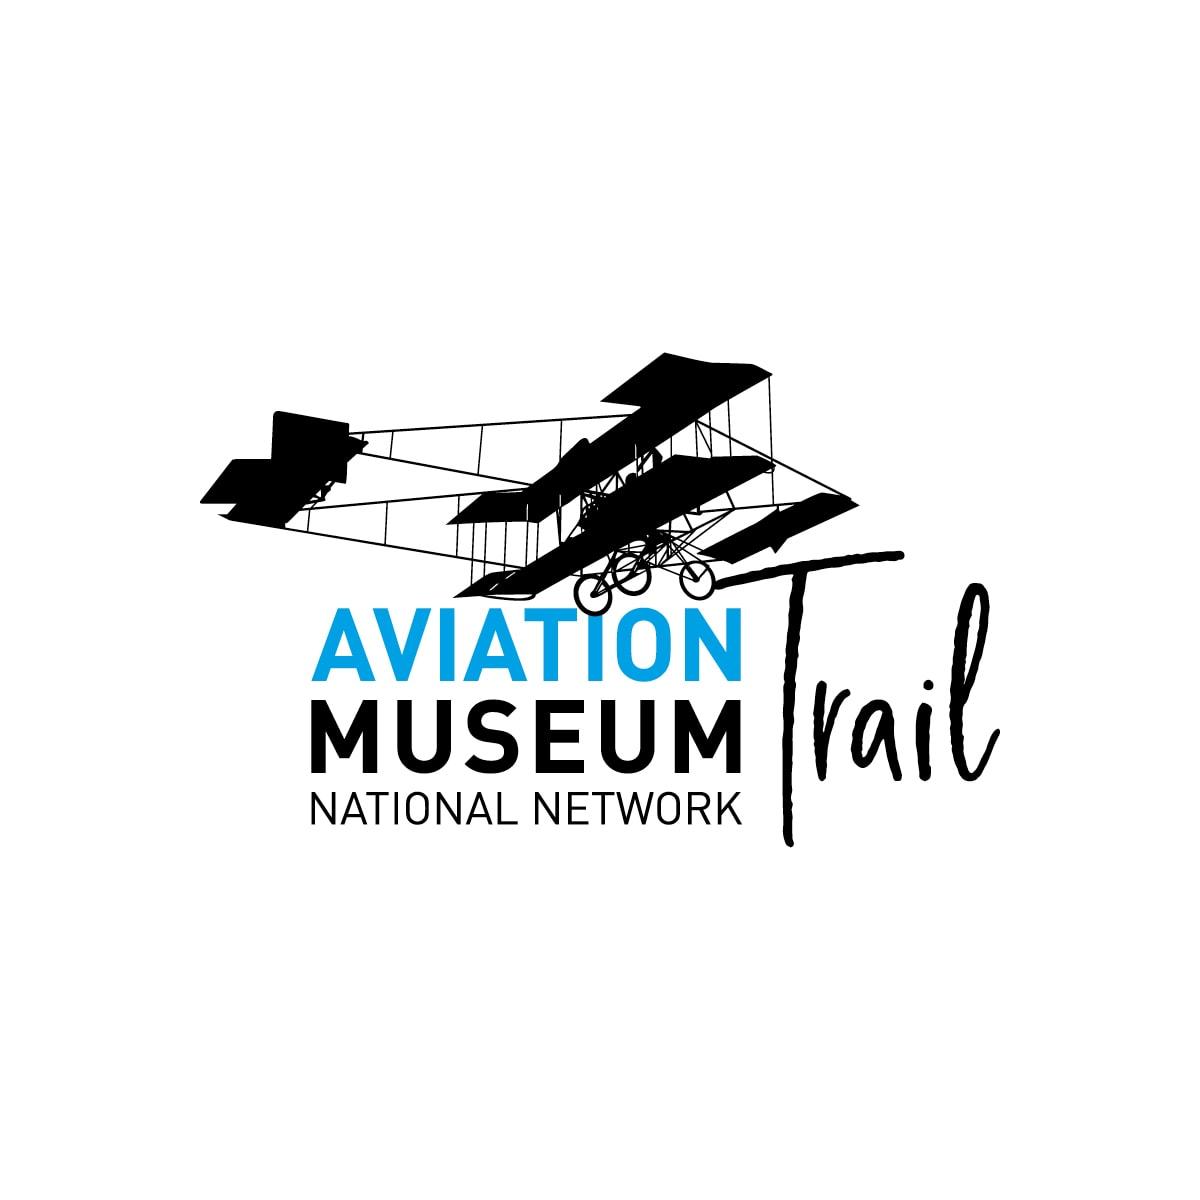 Logo Design Aviation Museum Trail